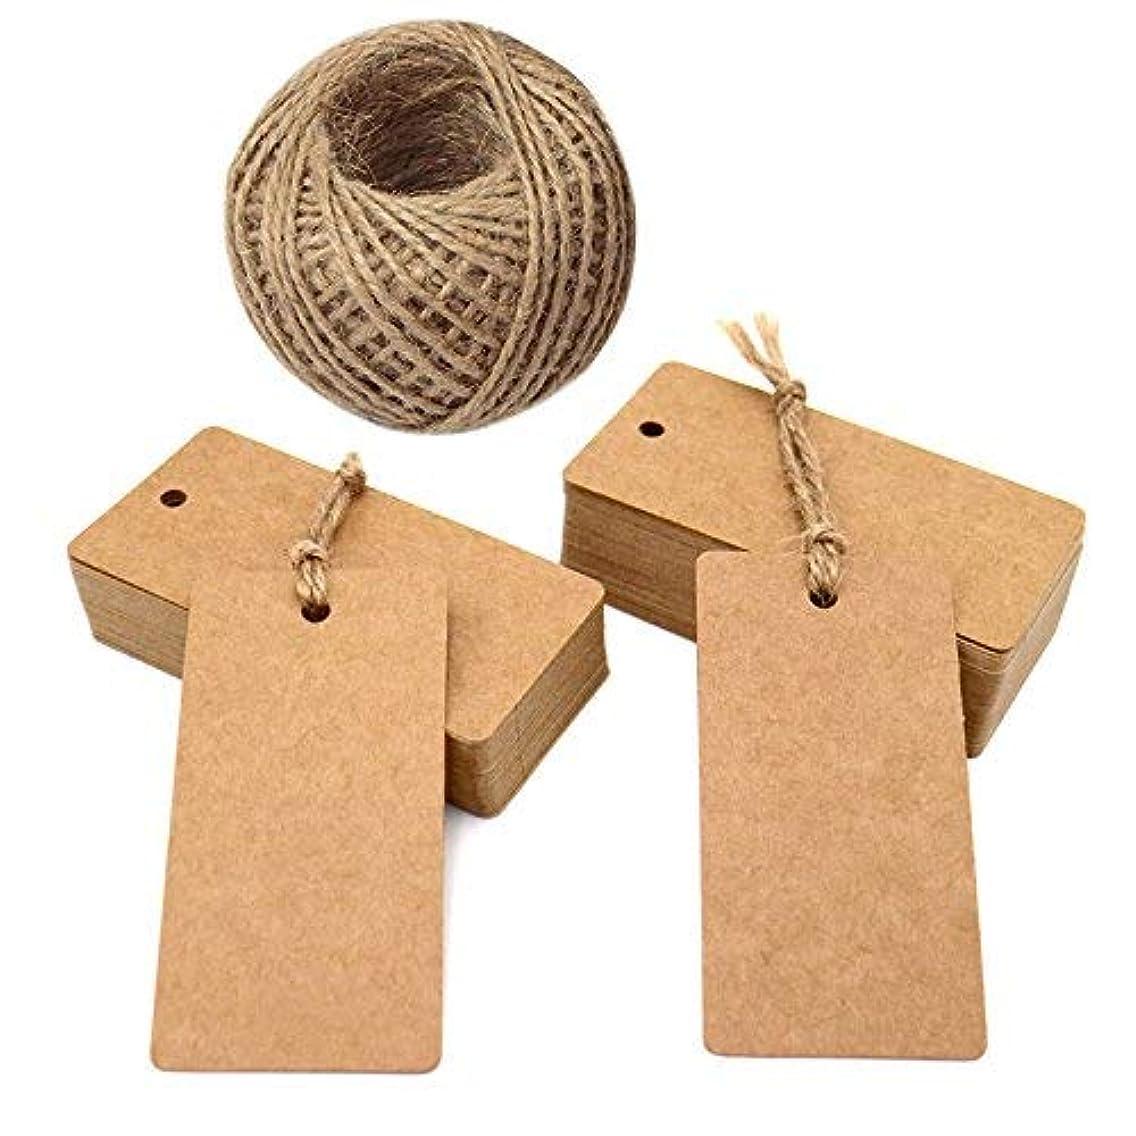 100 PCS Brown Kraft Paper Gift Tags,Rectangular Wedding Favor Kraft Hang Tags,Luggage Tags with 100 Feet Jute Twine